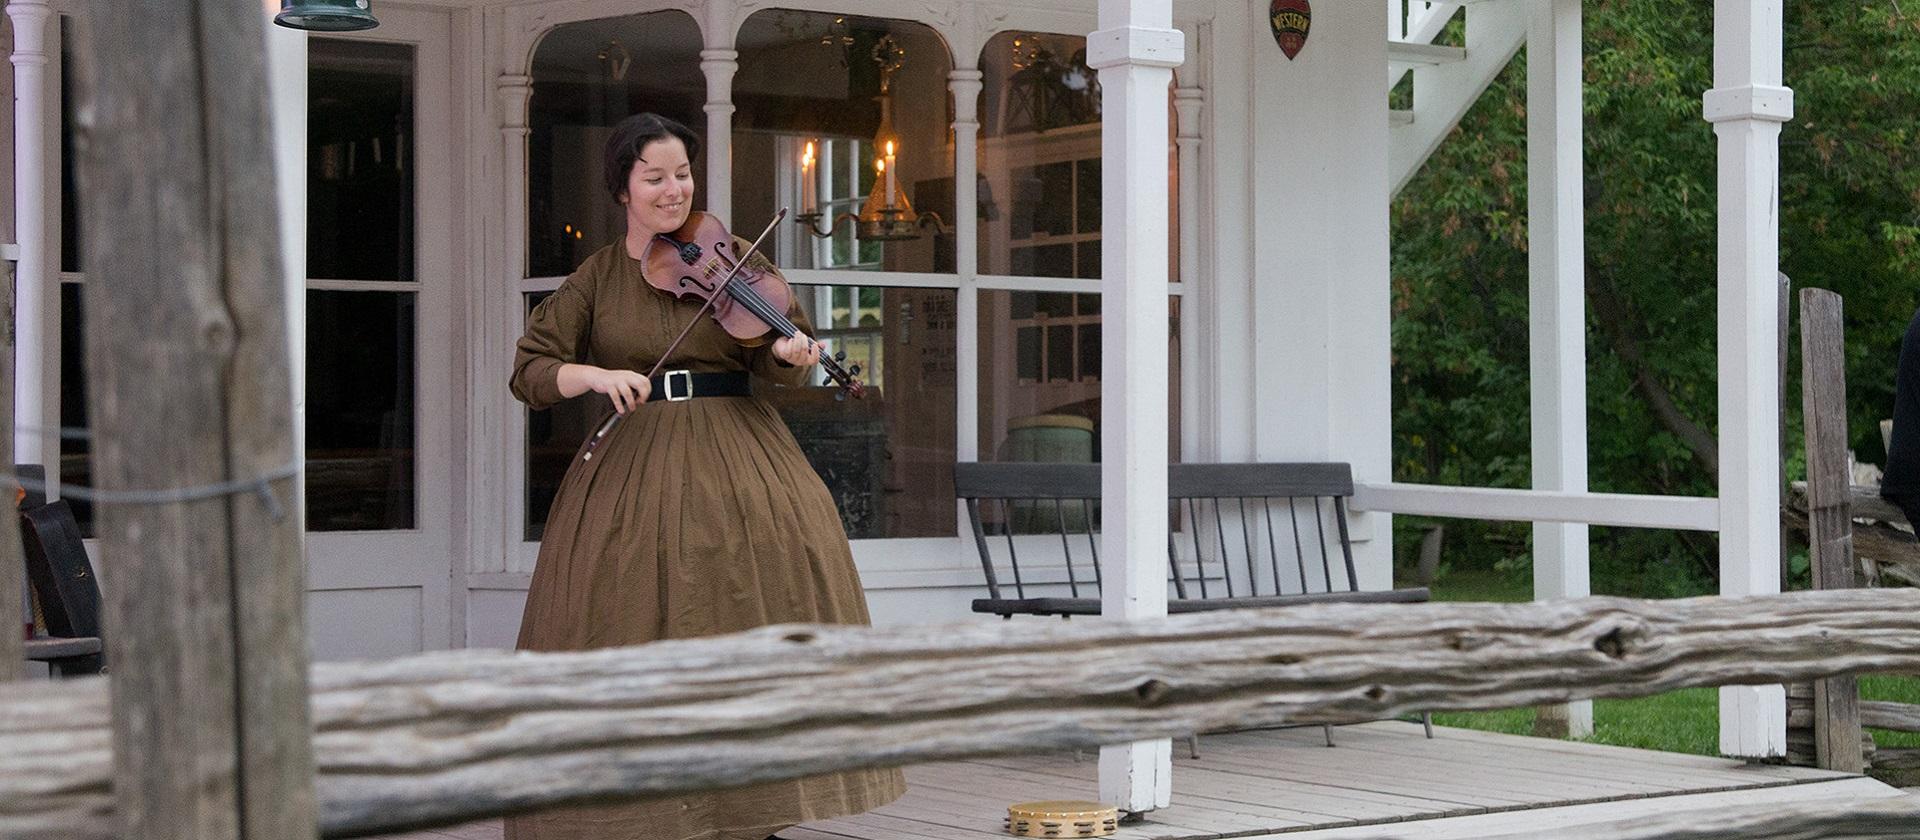 woman in period costume plays a violin at Black Creek Pioneer Village